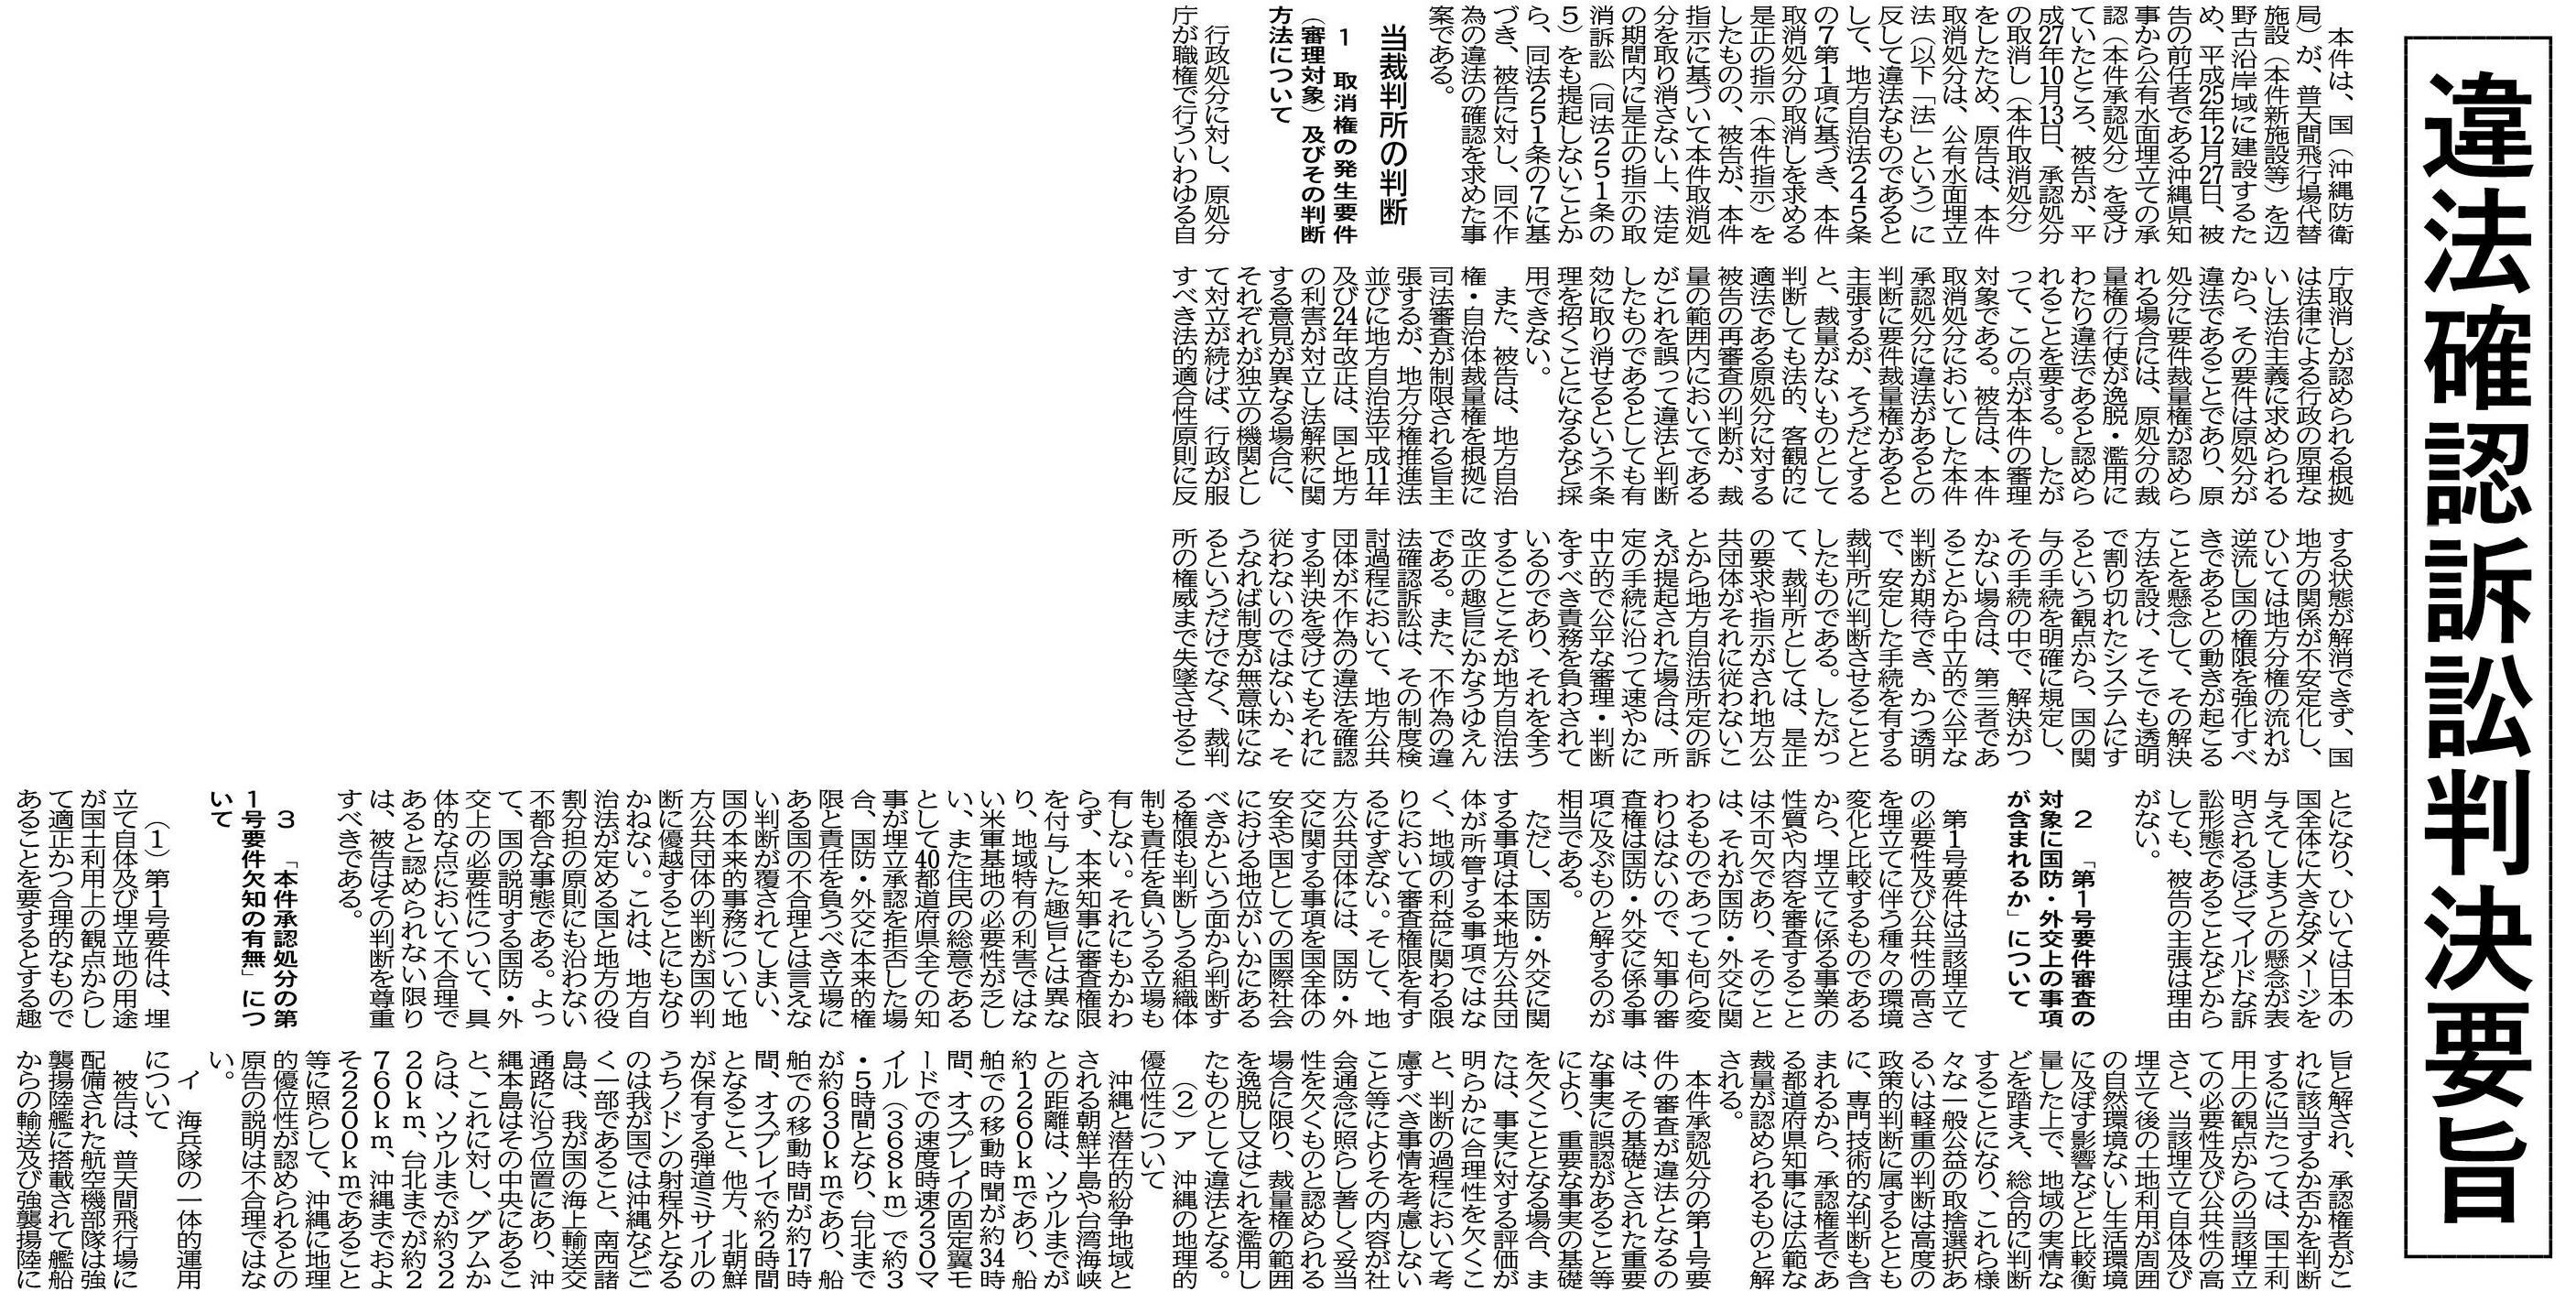 sinpou2016 0917hanketsu01